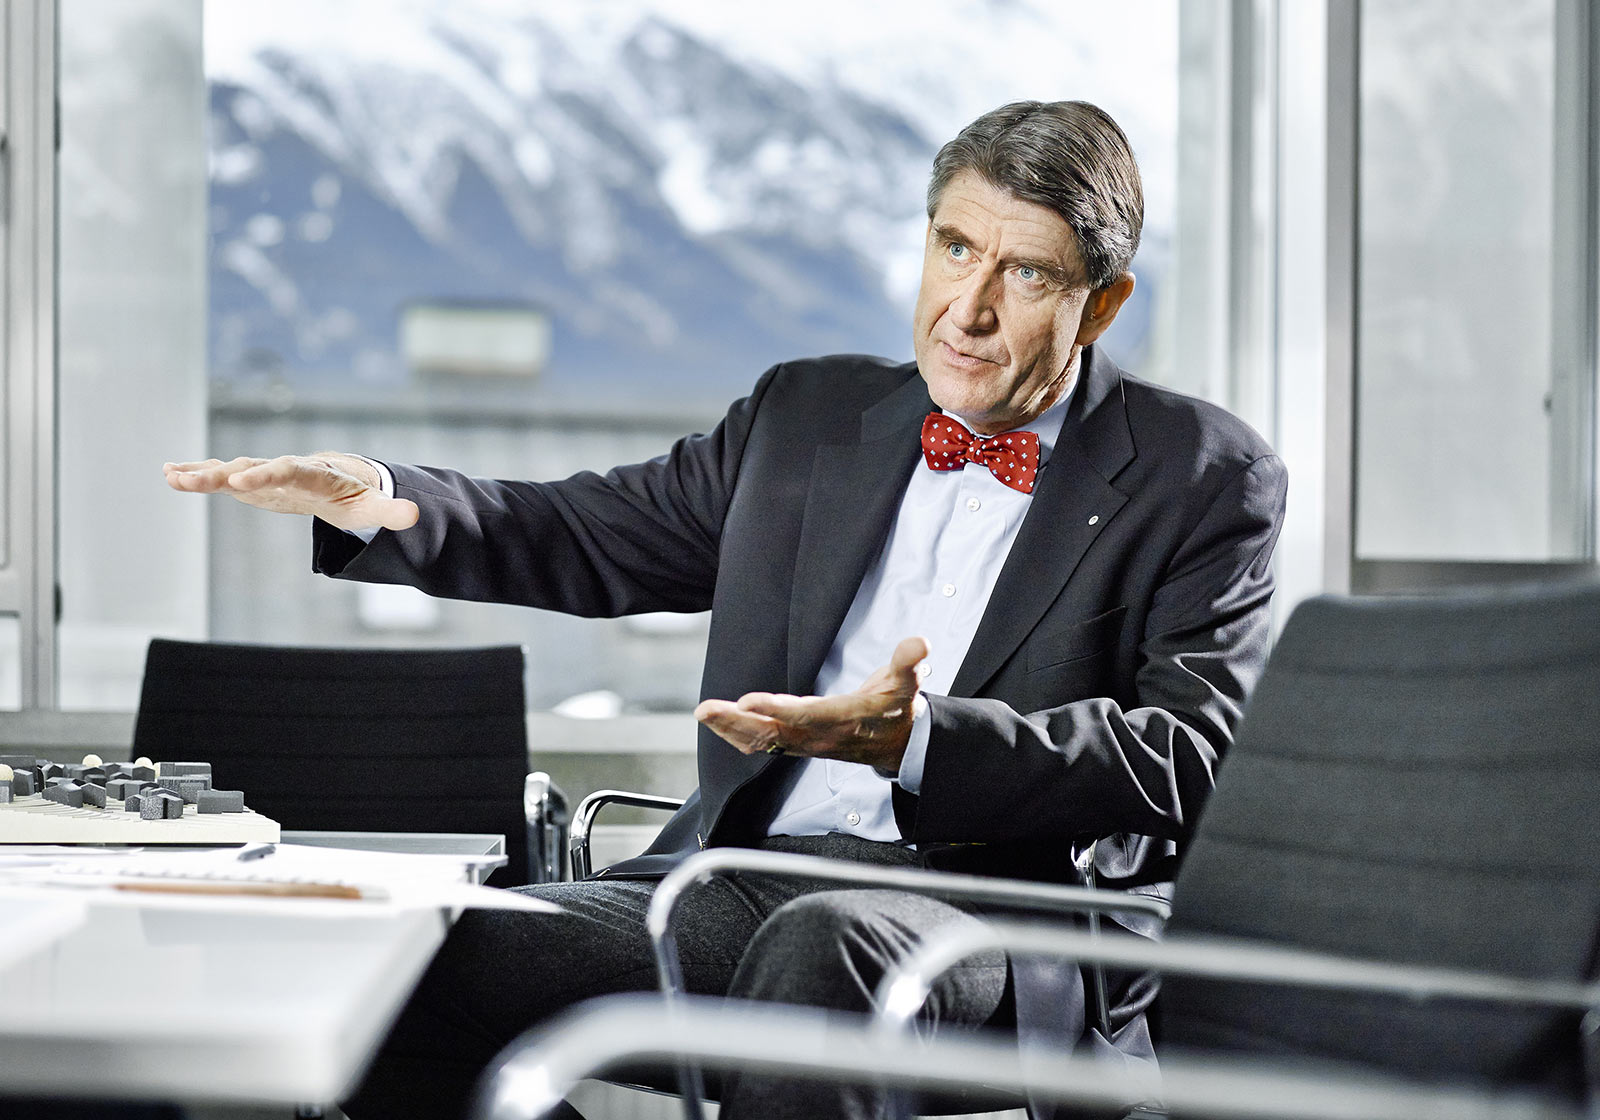 Professor Christoph M. Achammer lectures online. Photo: ATP/Becker